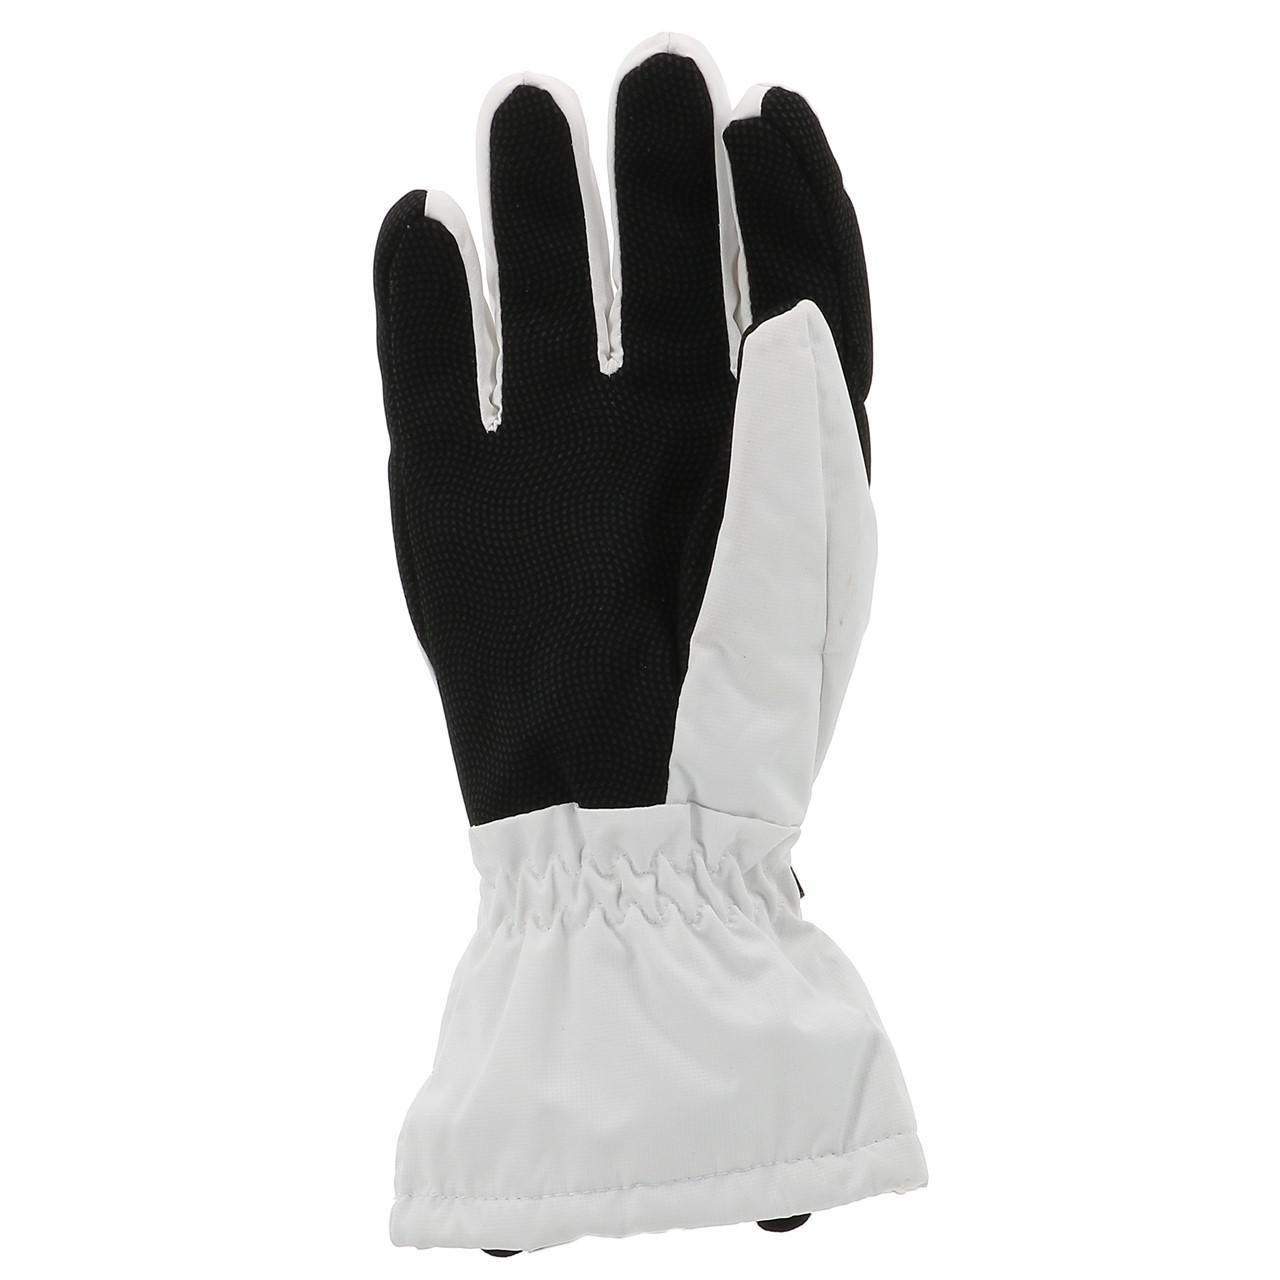 Gants-de-ski-Icepeak-Diisa-blanc-gants-ski-l-Blanc-14370-Neuf miniature 5